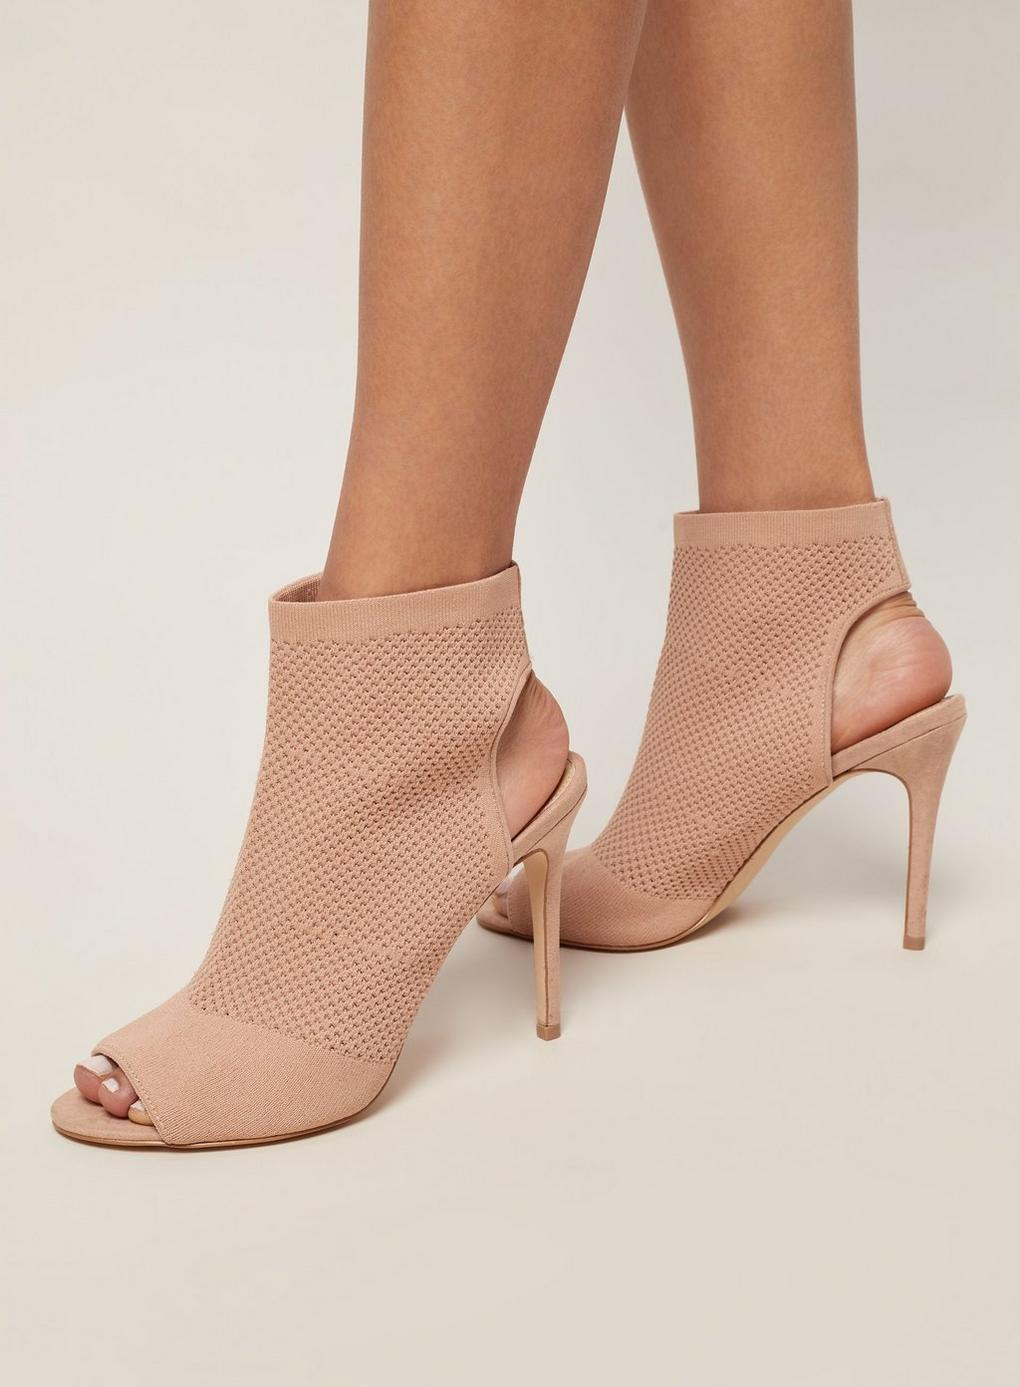 96cc8d50f32f Miss Selfridge - Pink Nude Candy Knitted Peep Toe Heel Sandals - Lyst. View  fullscreen